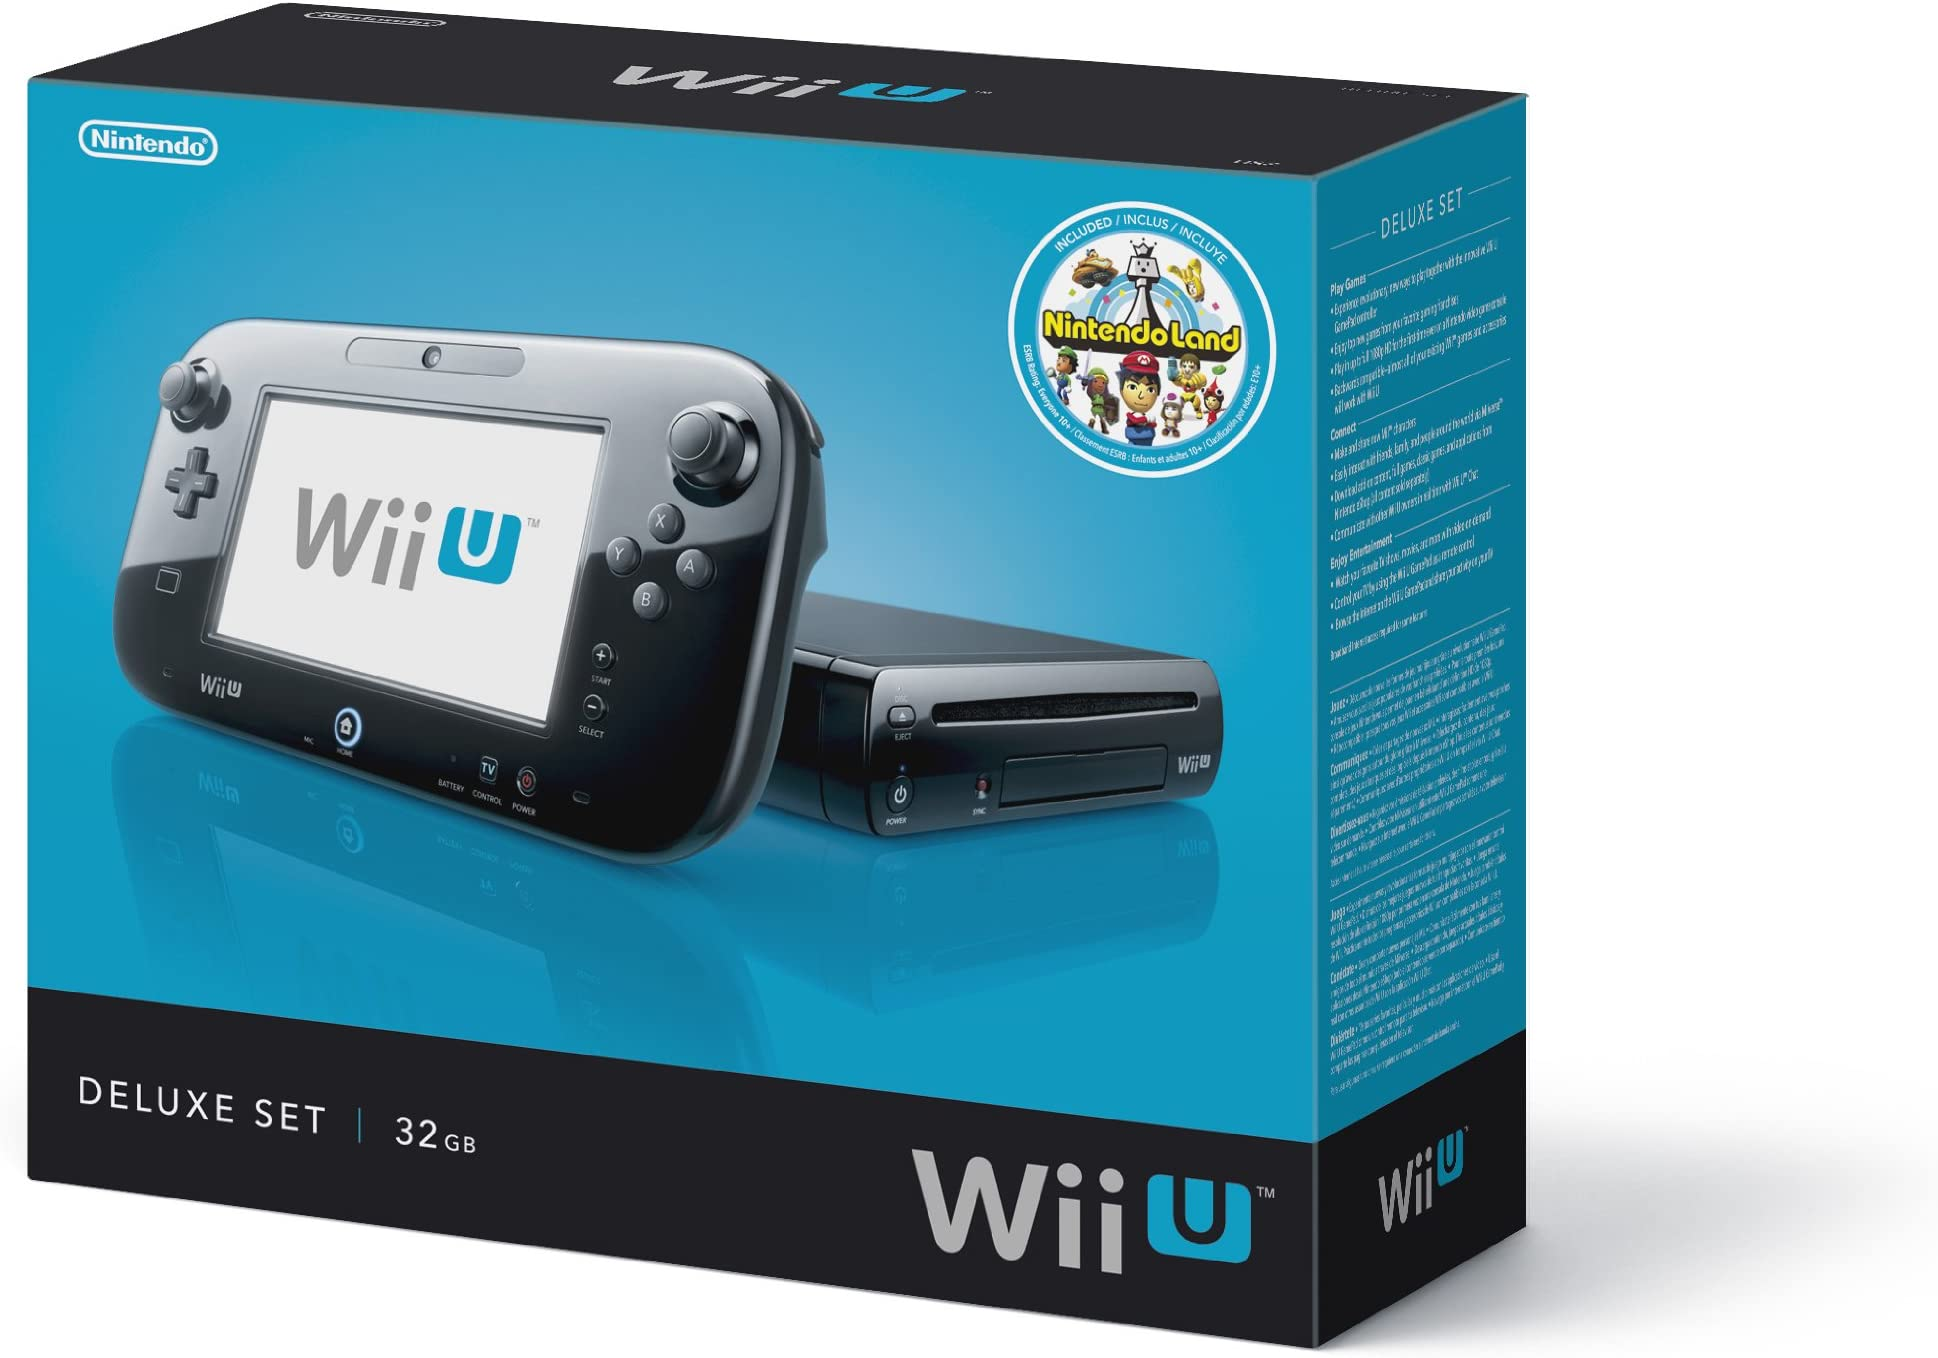 amazon com nintendo wii u console 32gb black deluxe set video games rh amazon com Wii Mini Wii U Console